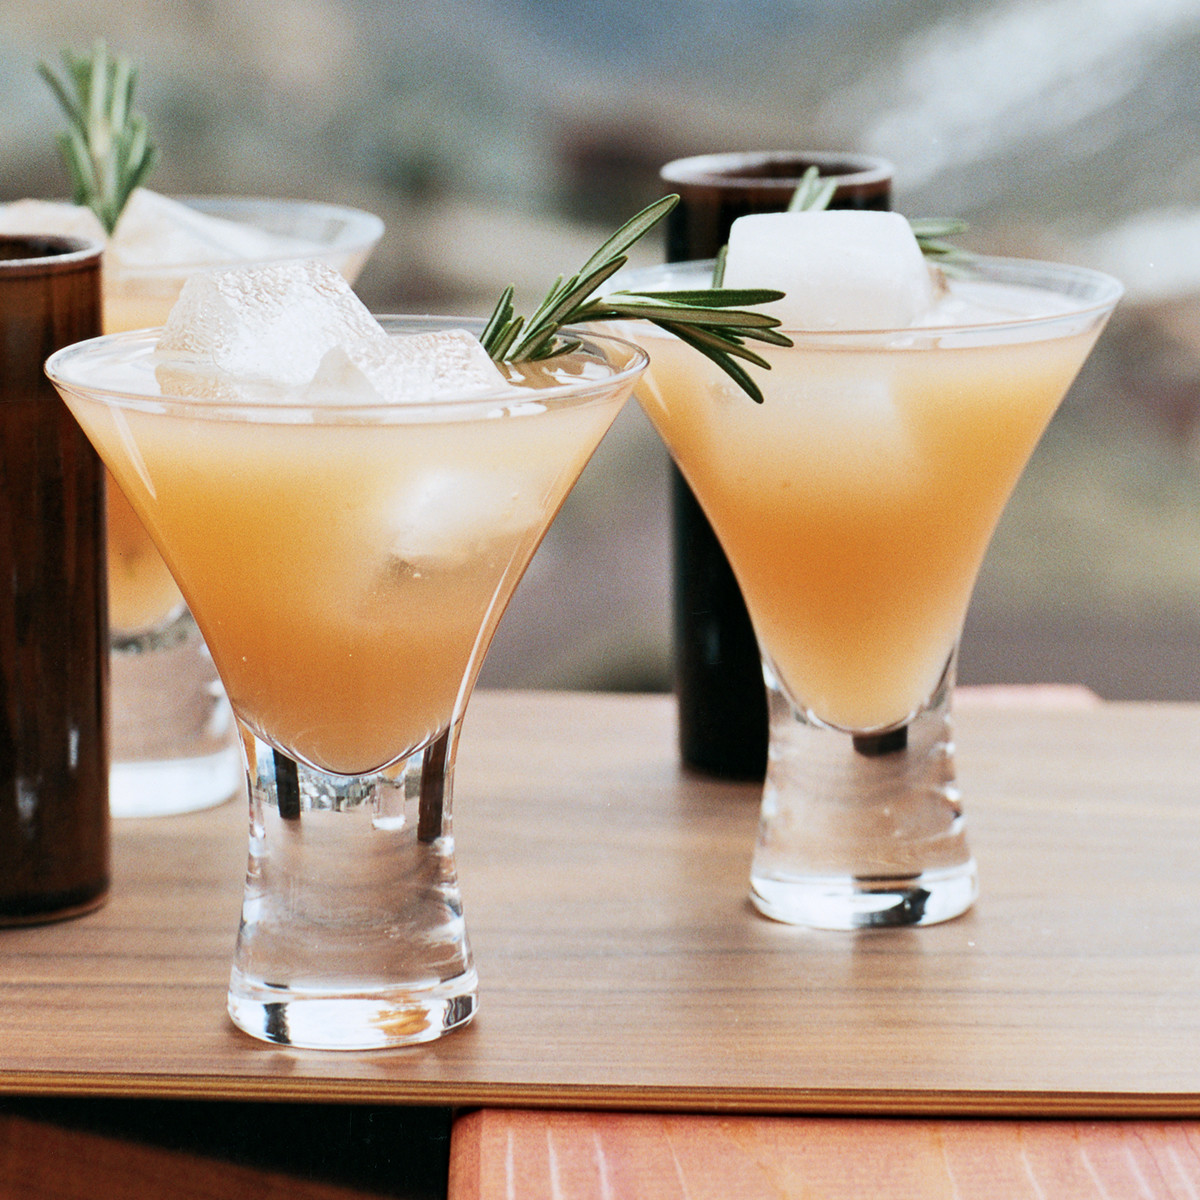 rosemary-ruby-cocktails-1207.jpg